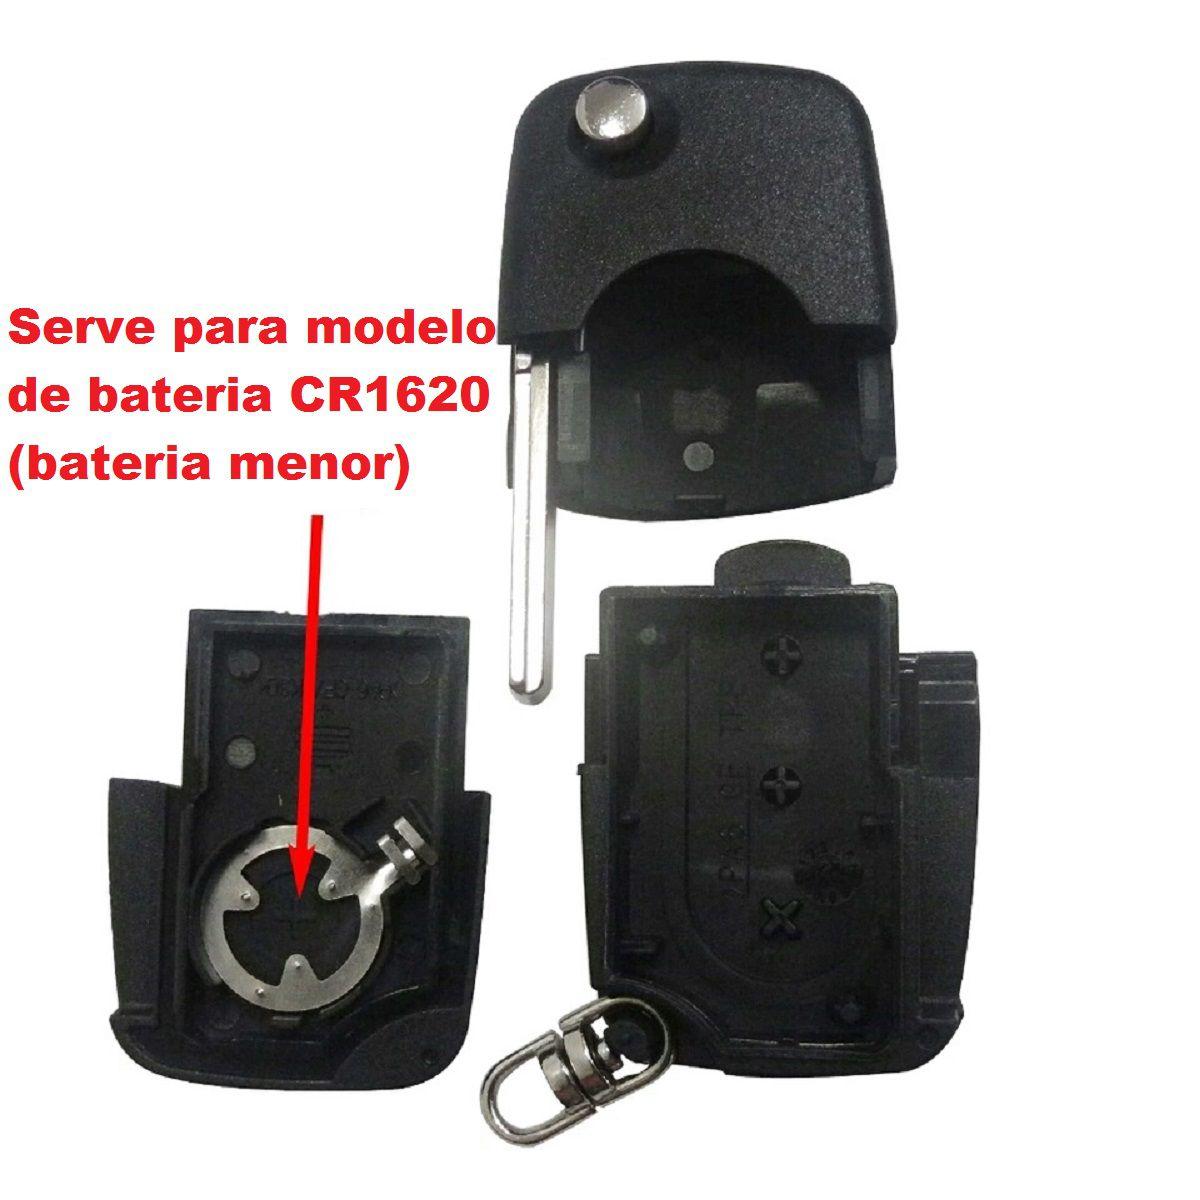 Chave Canivete Audi A3 A4 3 Botões Emblema e Lamina CR-1620